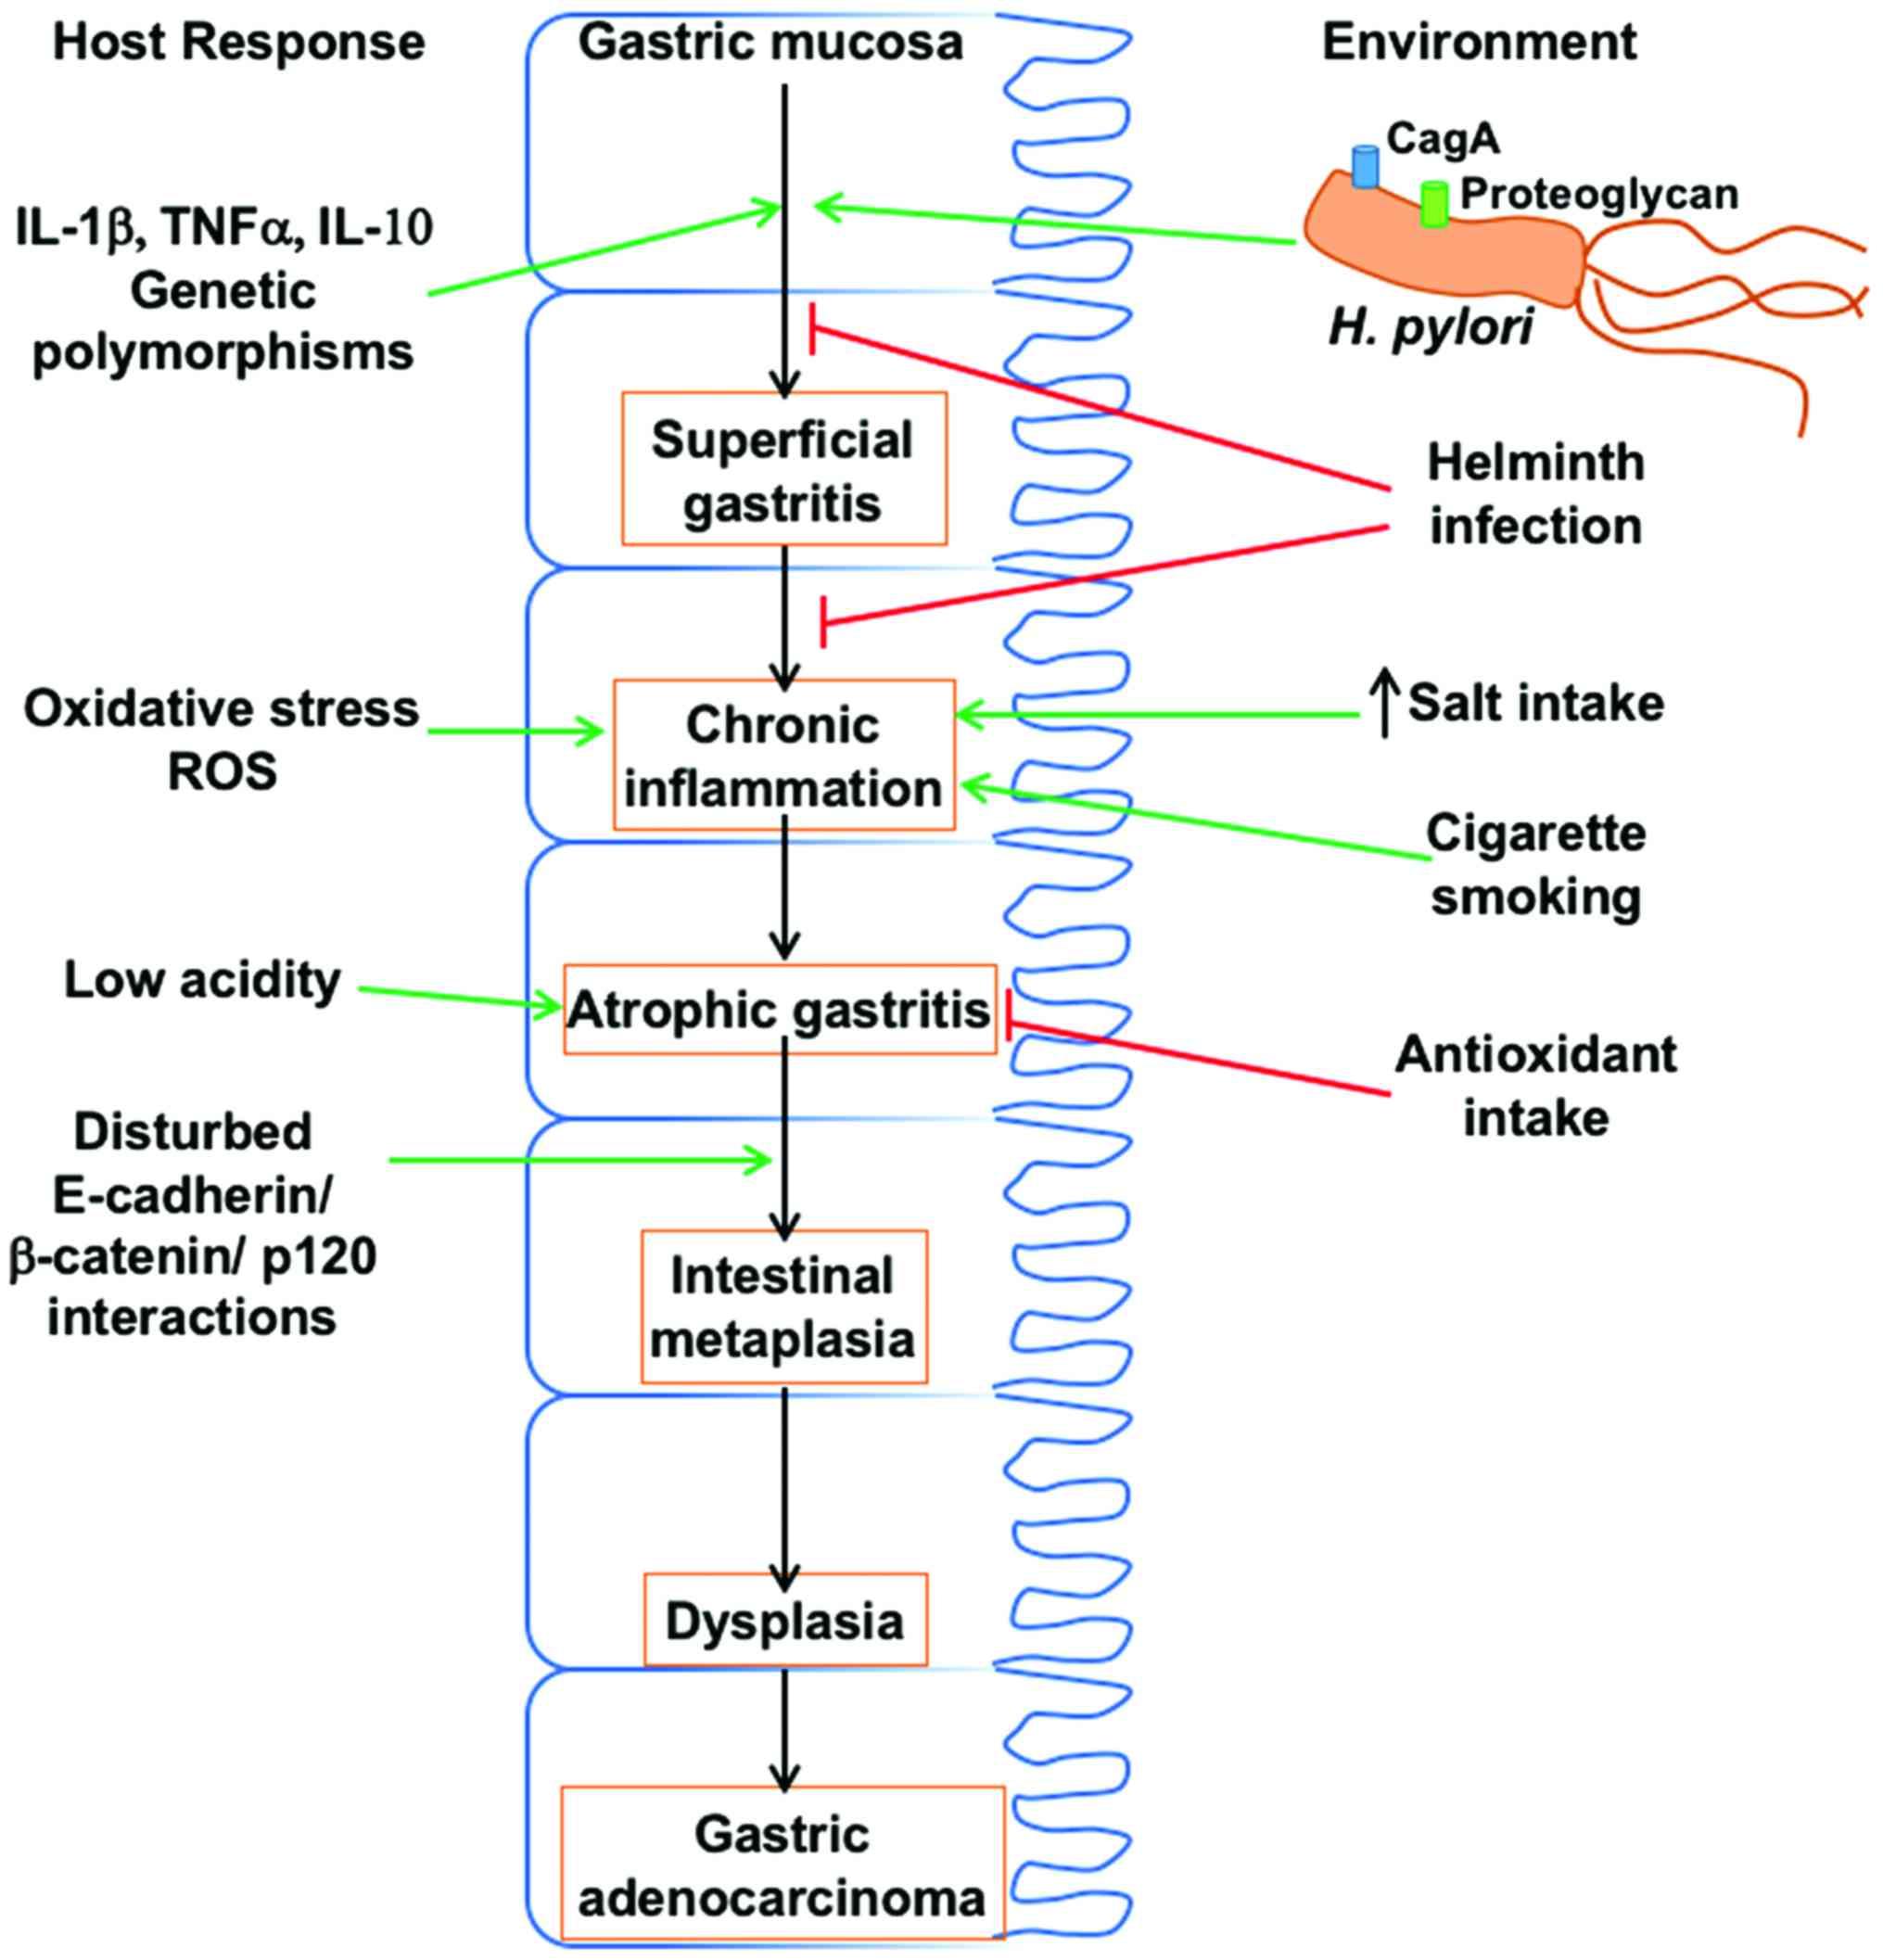 Gastric cancer from h pylori. Ce este cancerul gastric?